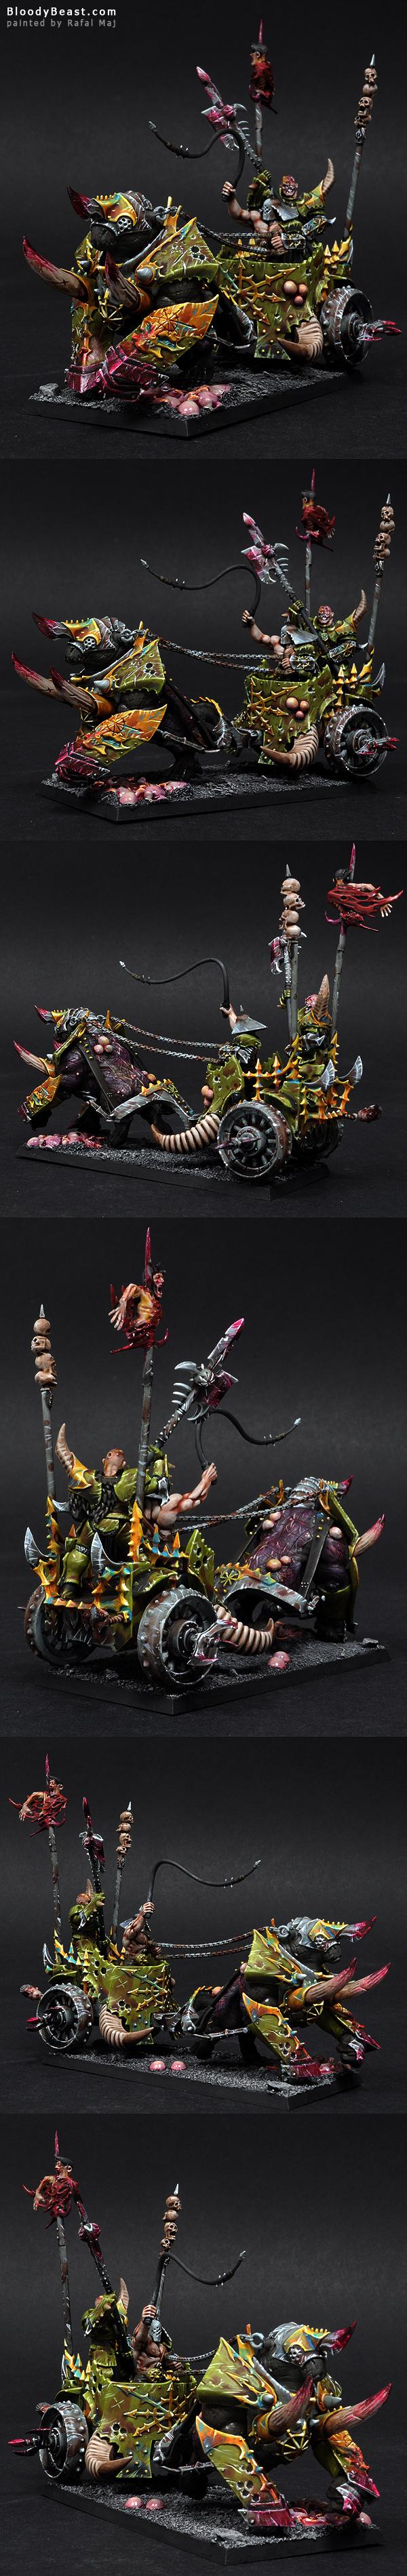 Nurgle Gorebeast Chariot painted by Rafal Maj (BloodyBeast.com)